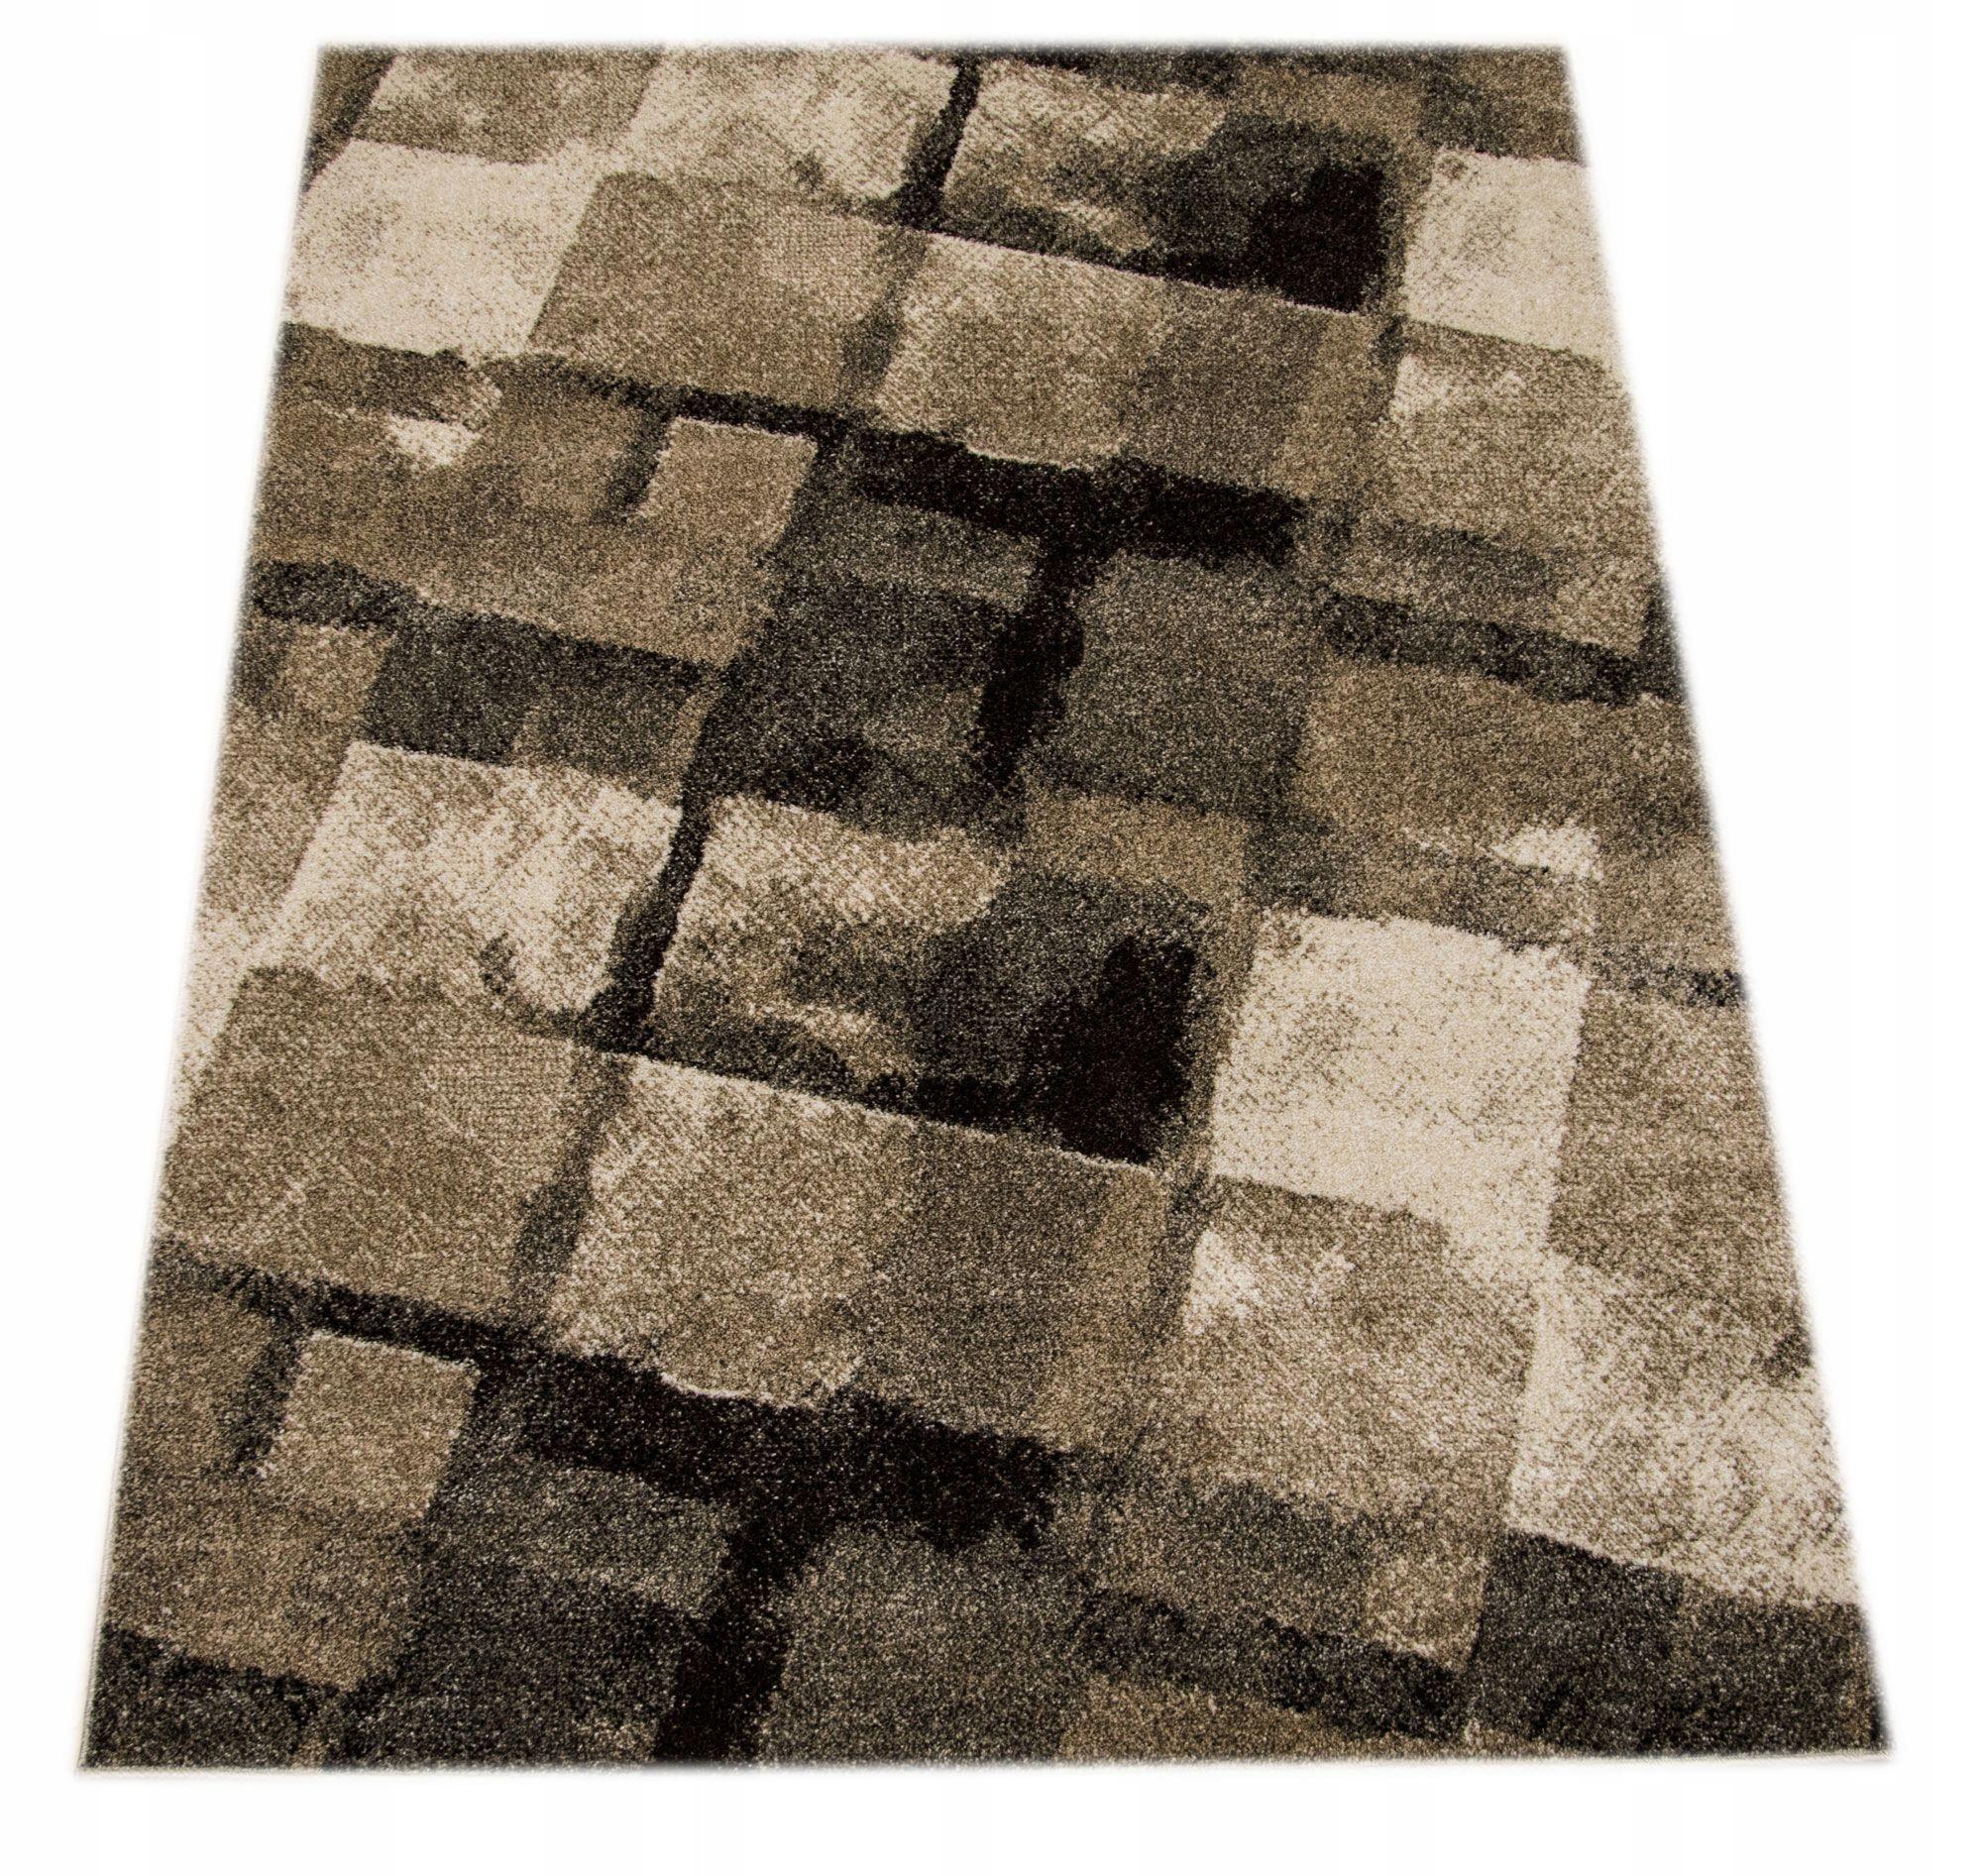 Koberec Aspekt 1.4x1.9 cm Vintage betónu